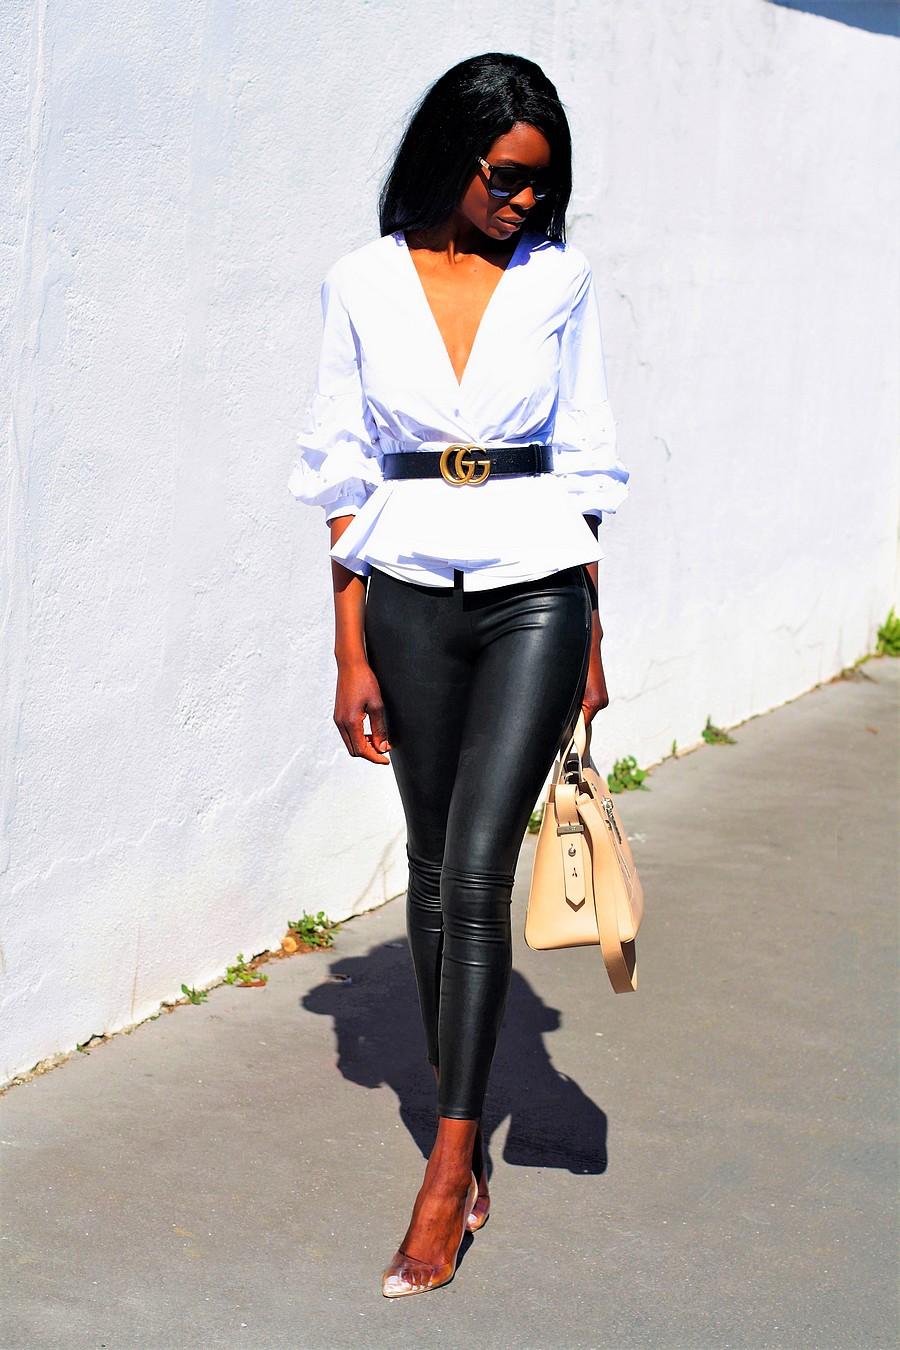 pantalon-cuir-chemise-manches-bouffantes-sac-kenzo-escarpins-perspex